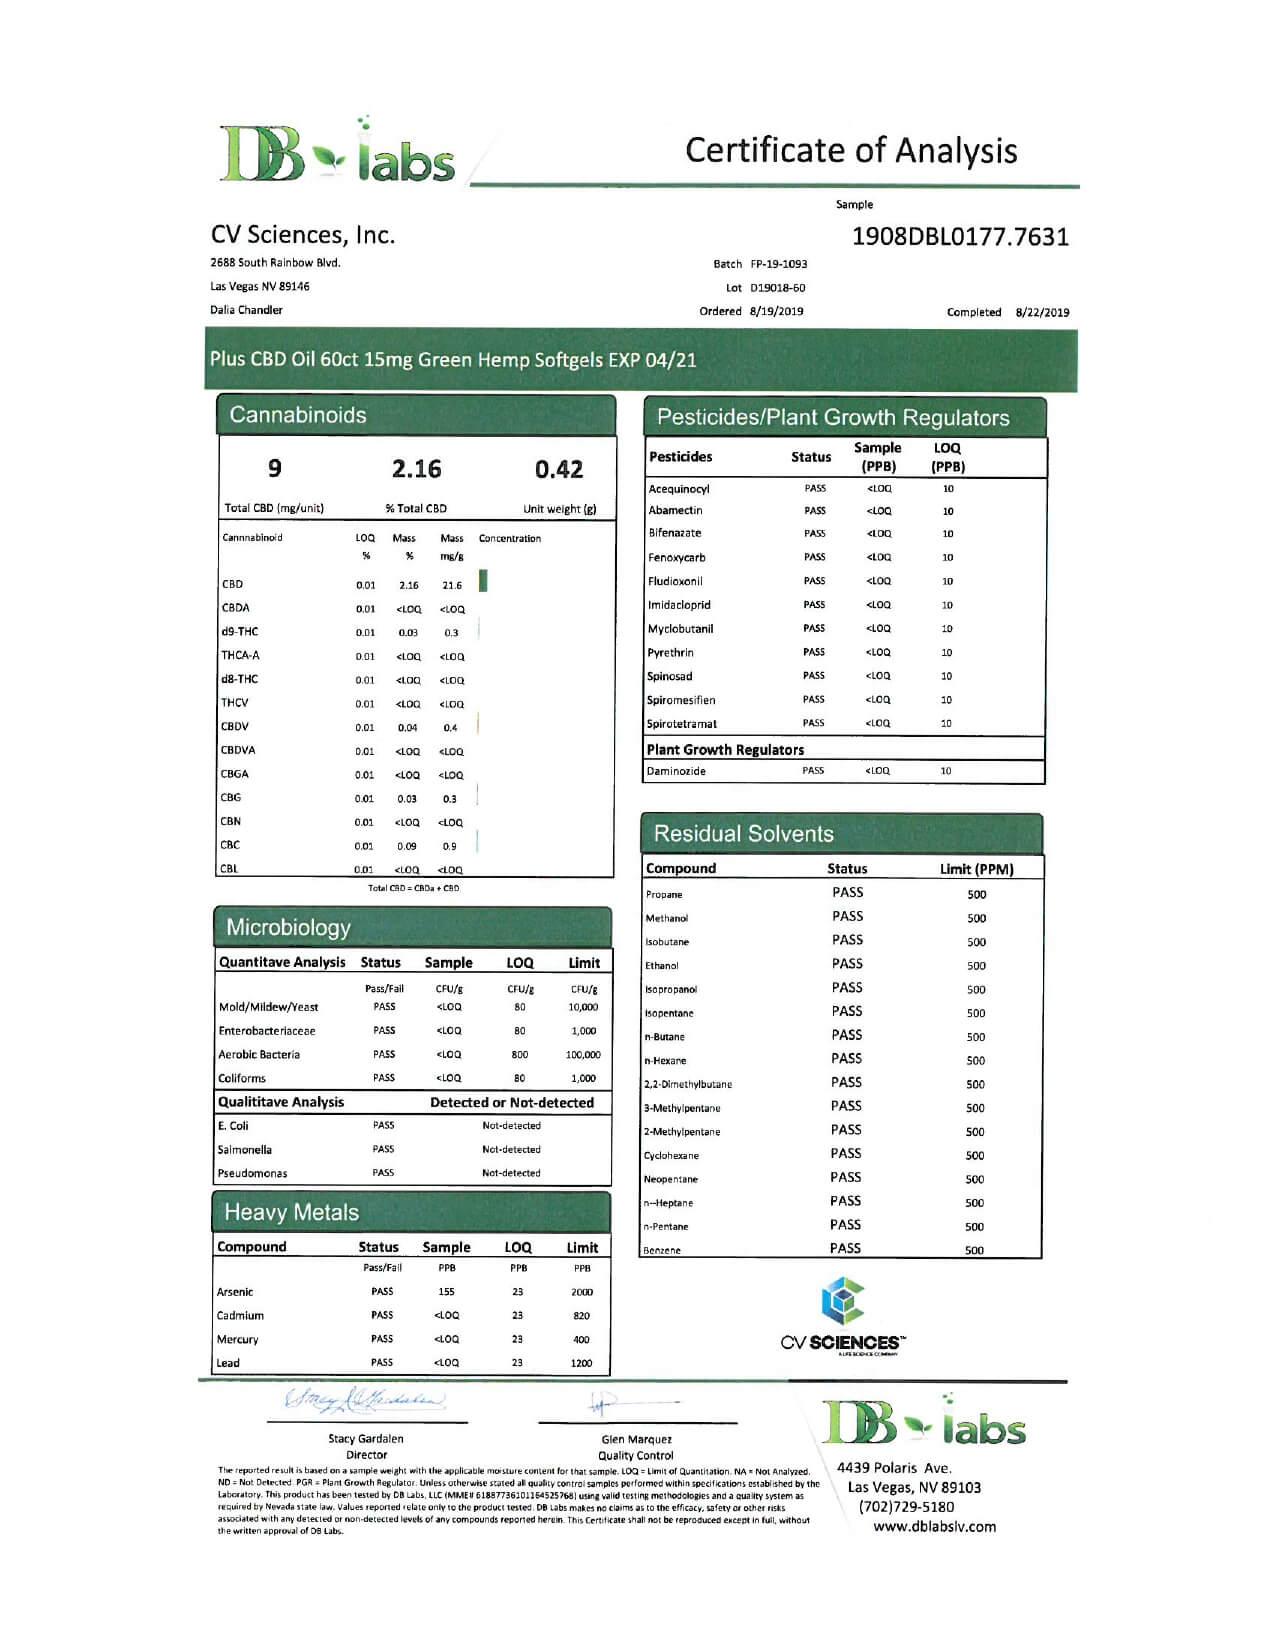 PlusCBD Oil CBD Softgels Green Blend Full Spectrum 10mg 60ct Lab Report